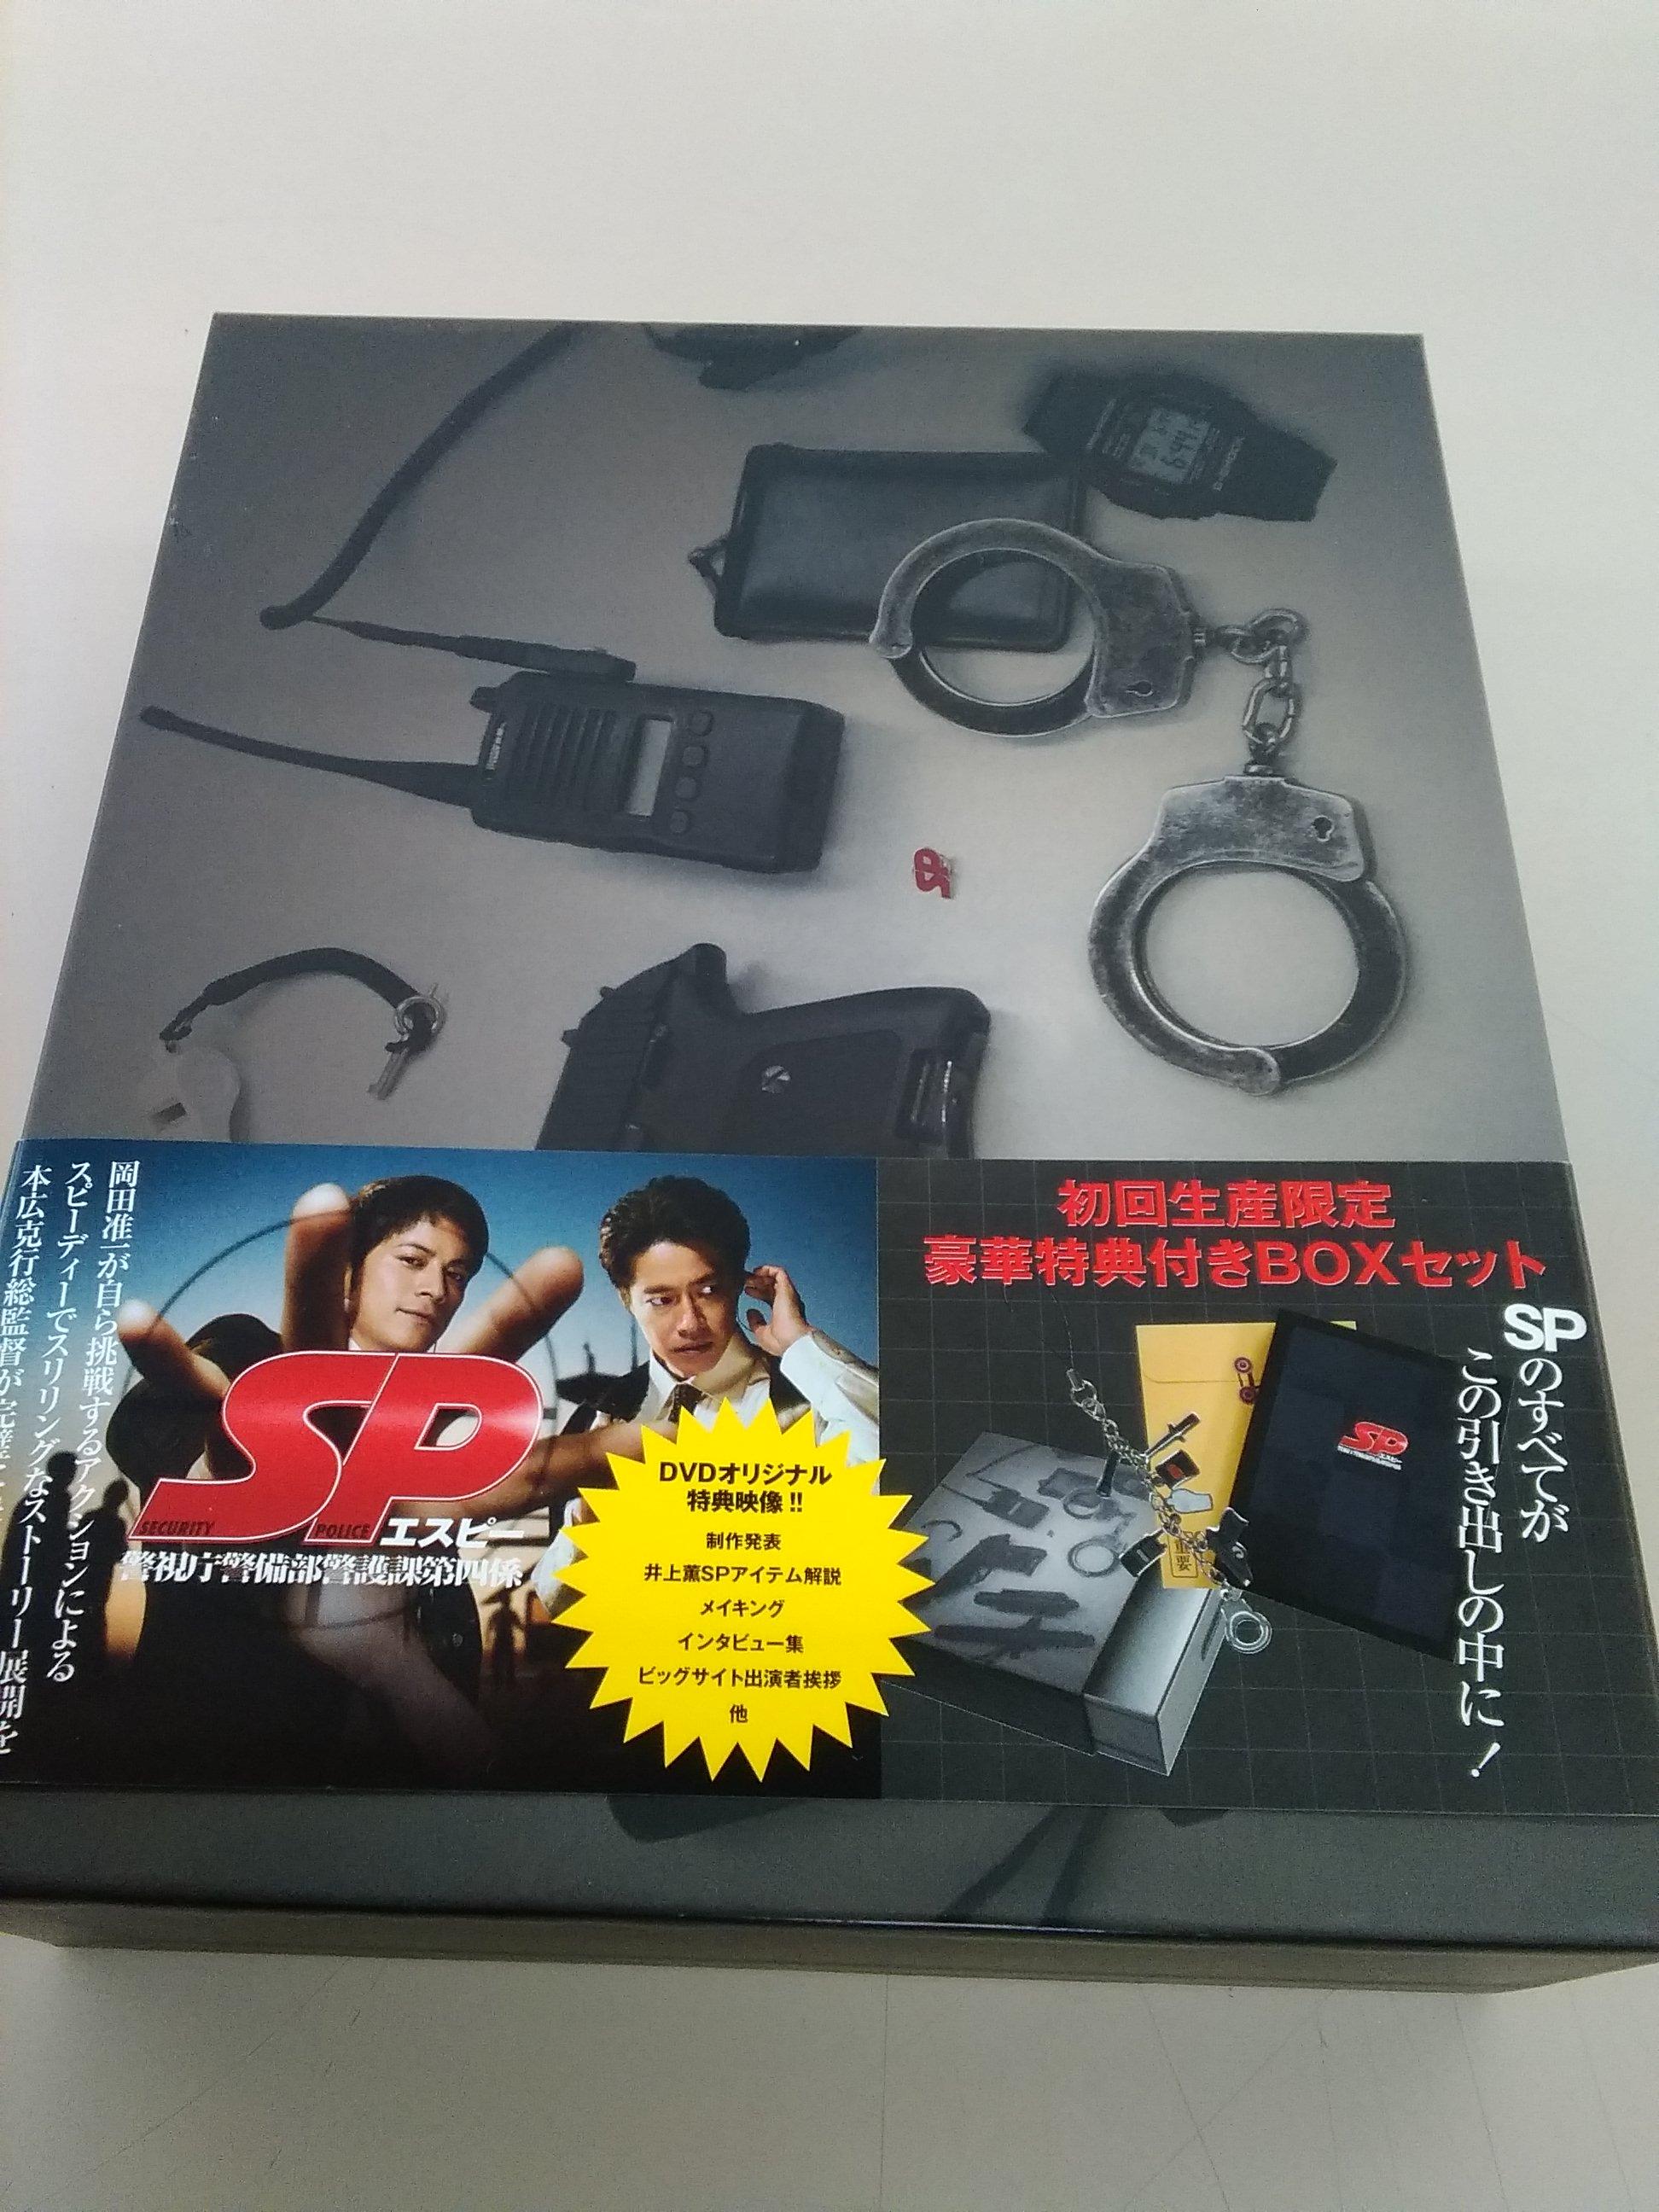 SP エスピー 警視庁警備部警護課第四係 DVD-BOX|フジテレビ